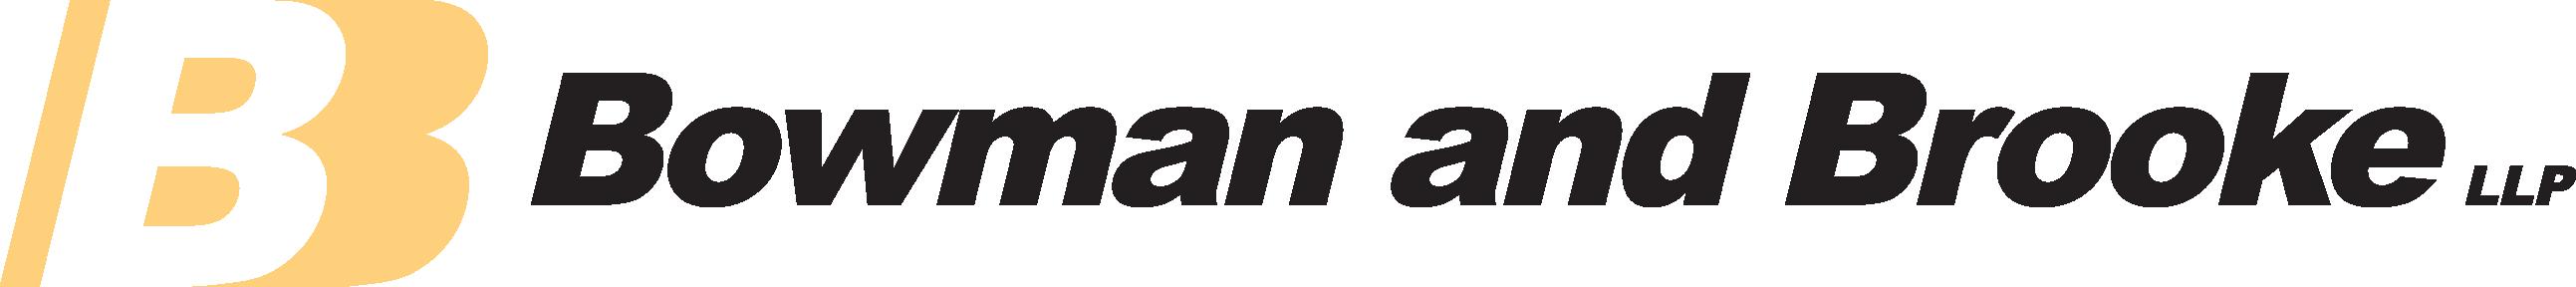 BB Logo High Res